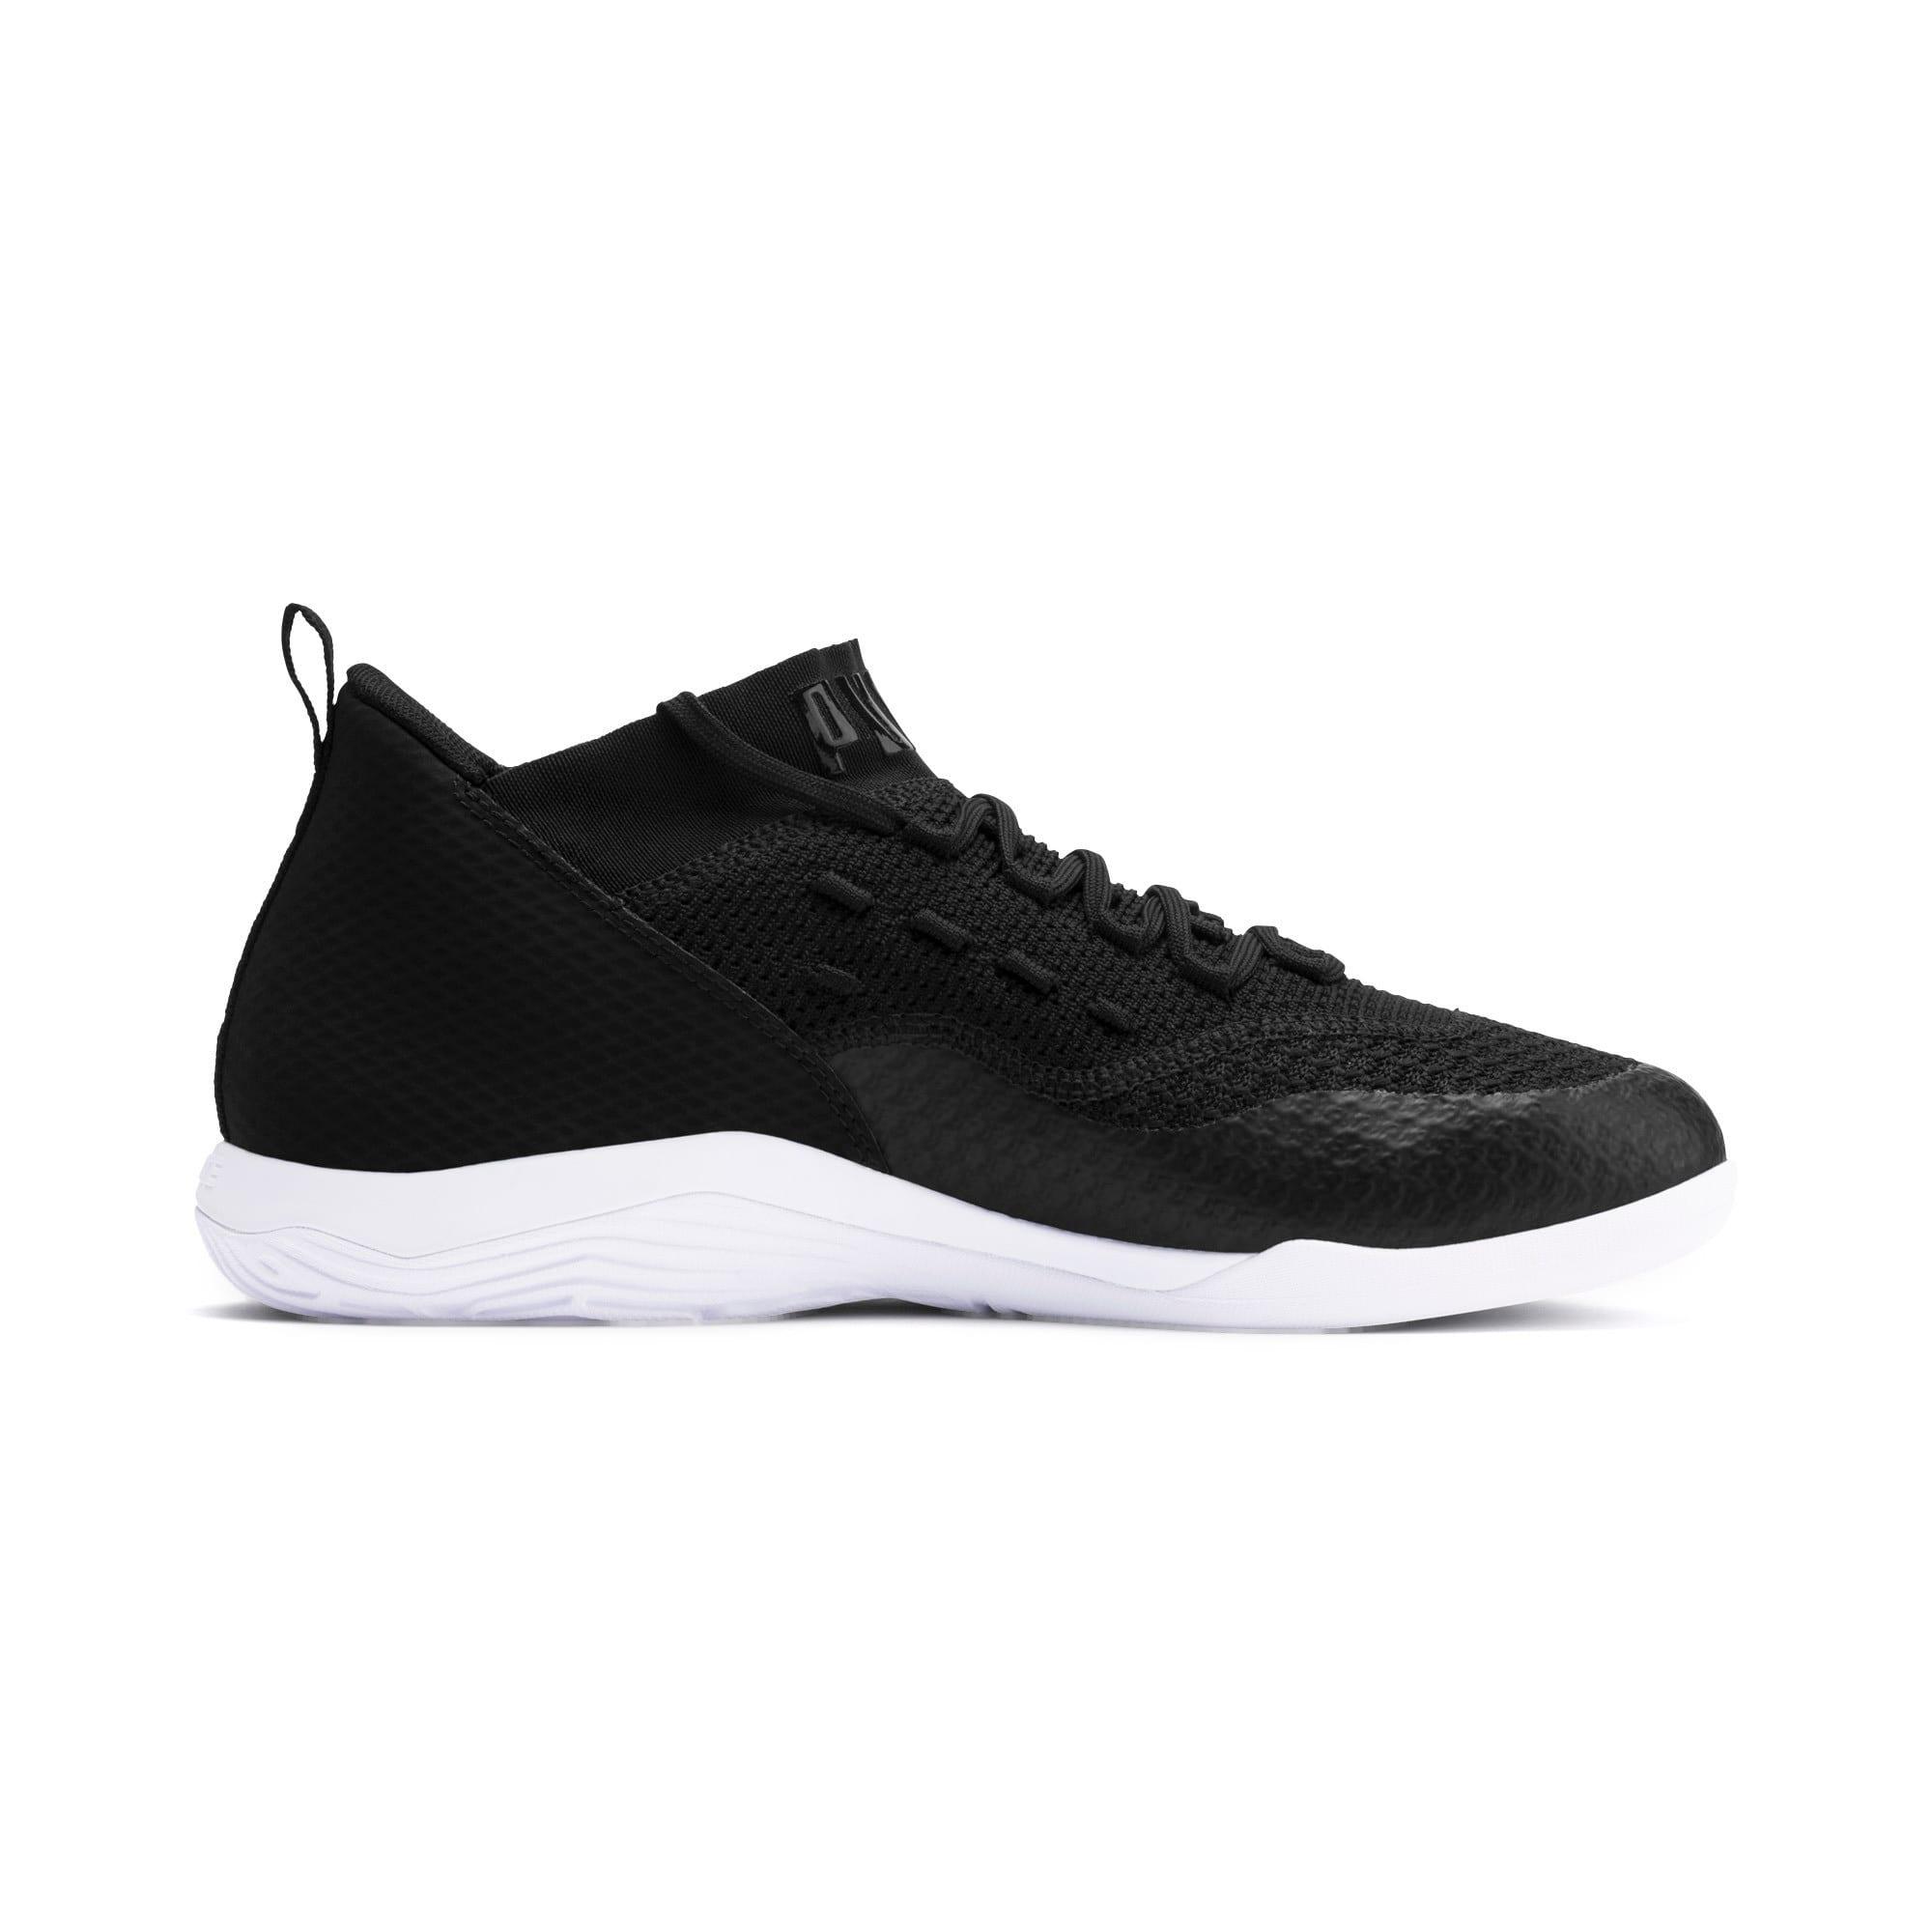 Thumbnail 5 of 365 IGNITE FUSE 2 Men's Soccer Shoes, Puma Black-Puma White, medium